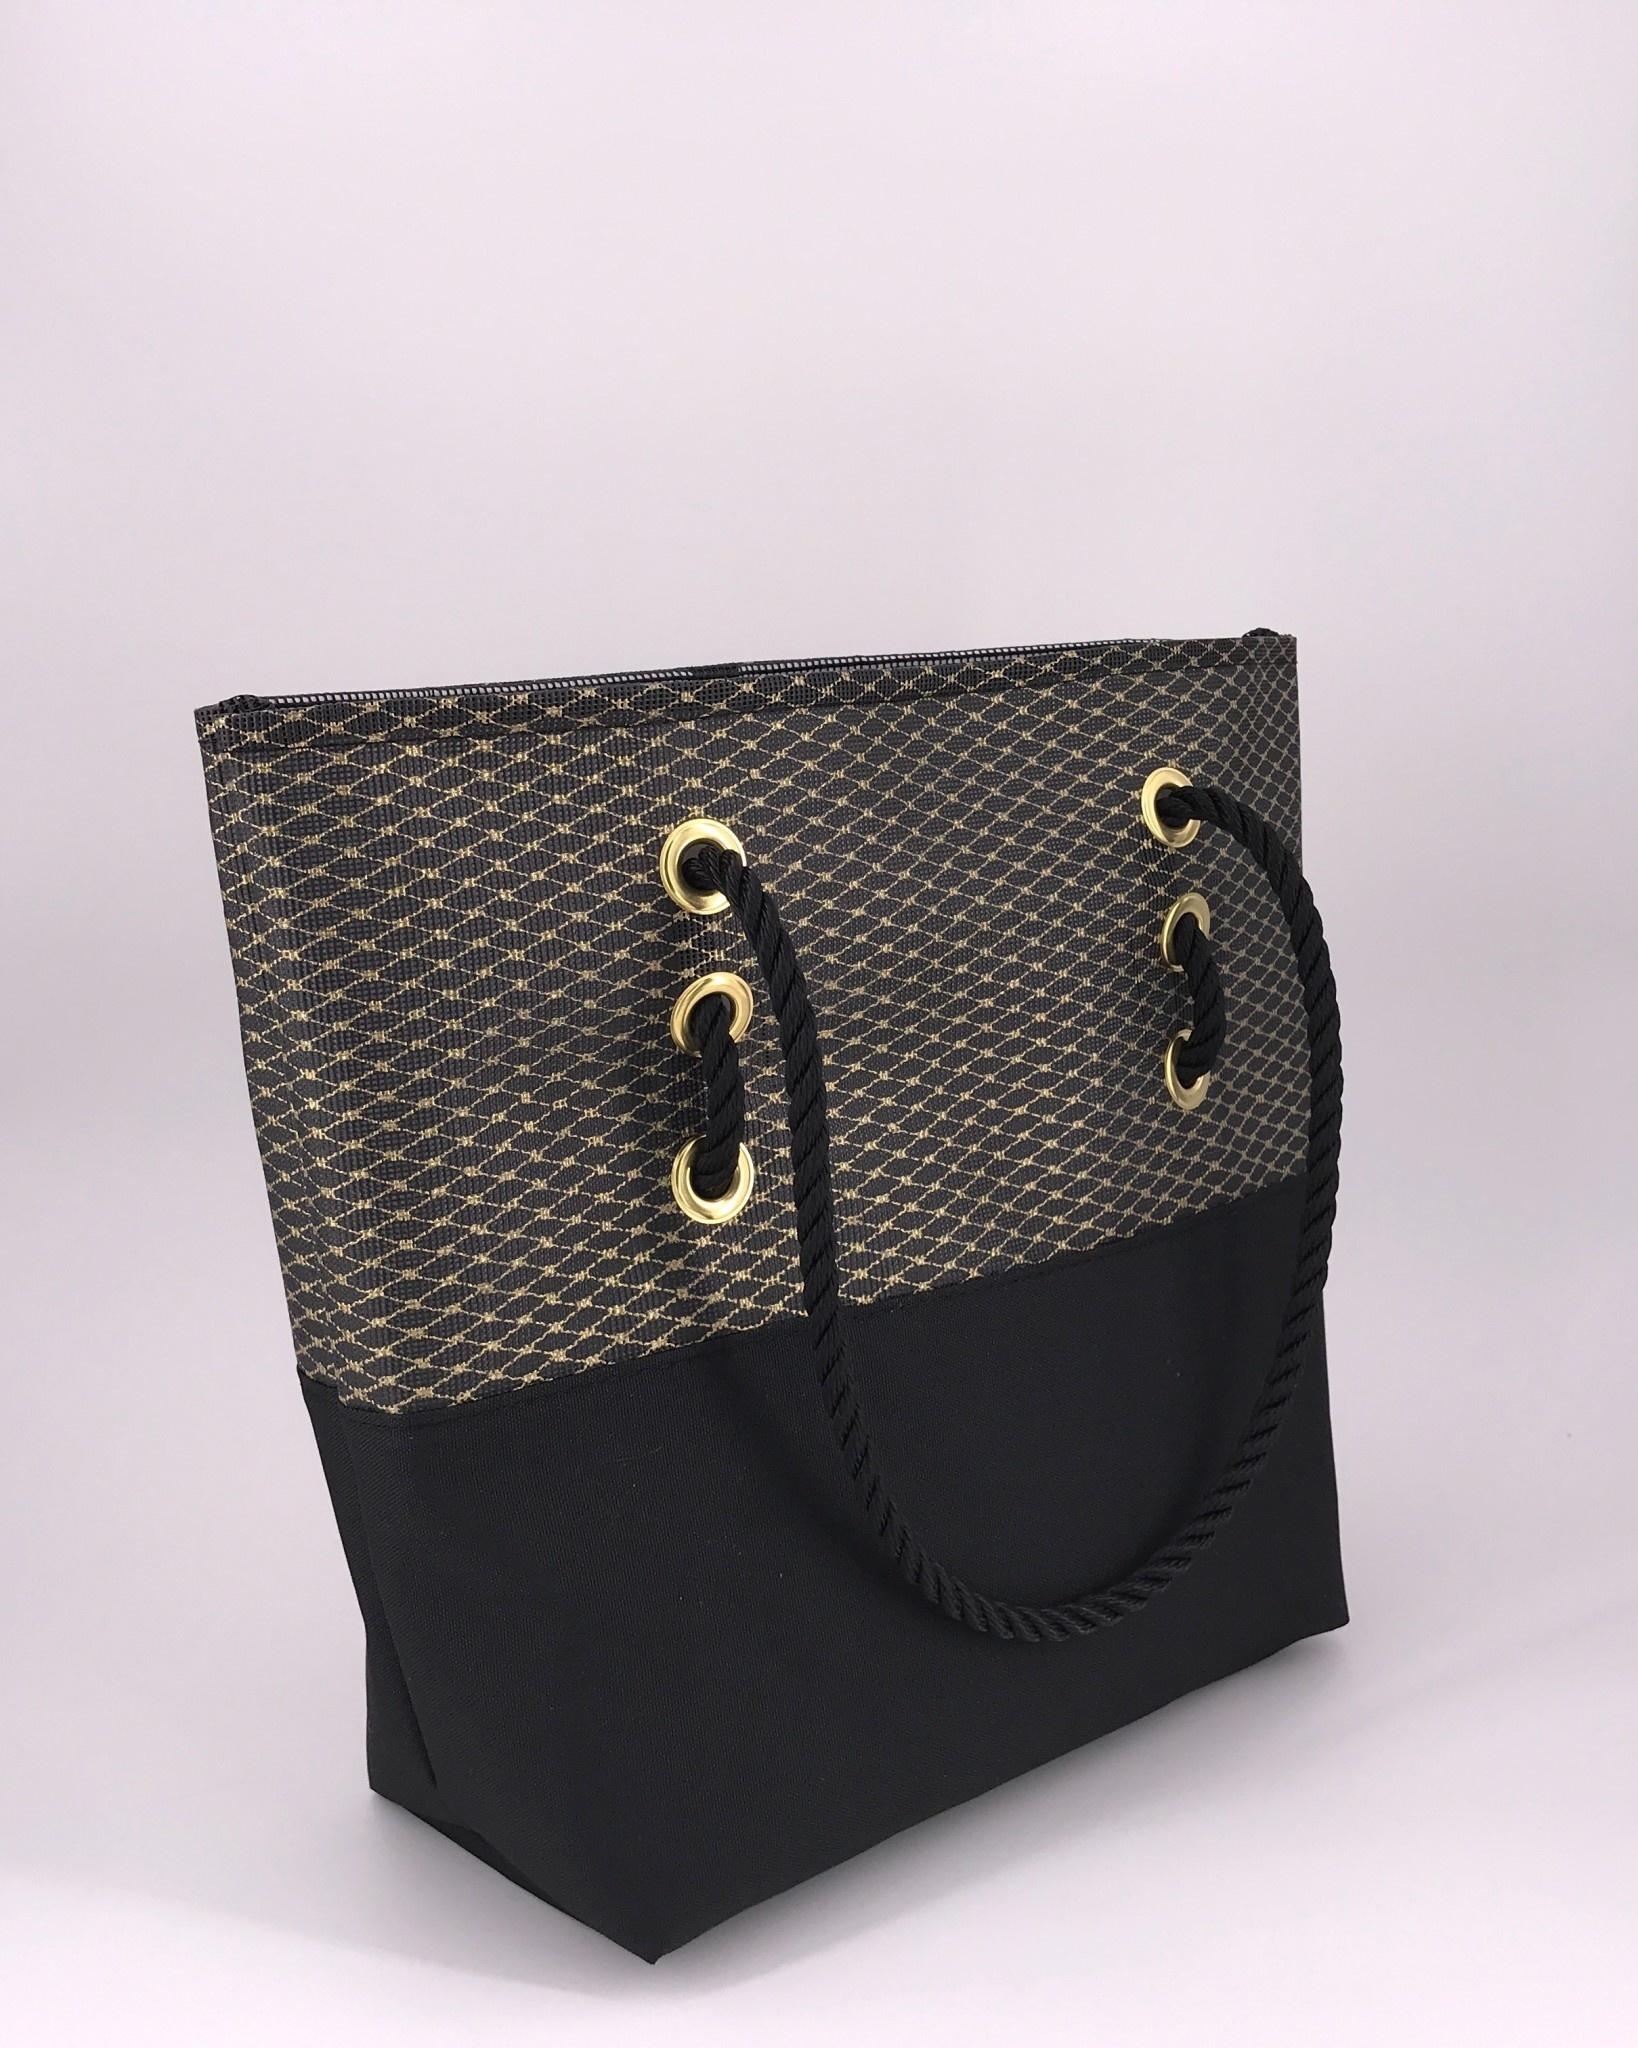 Alaina Marie ® Mini Gold Metallic on Black & Black Tote